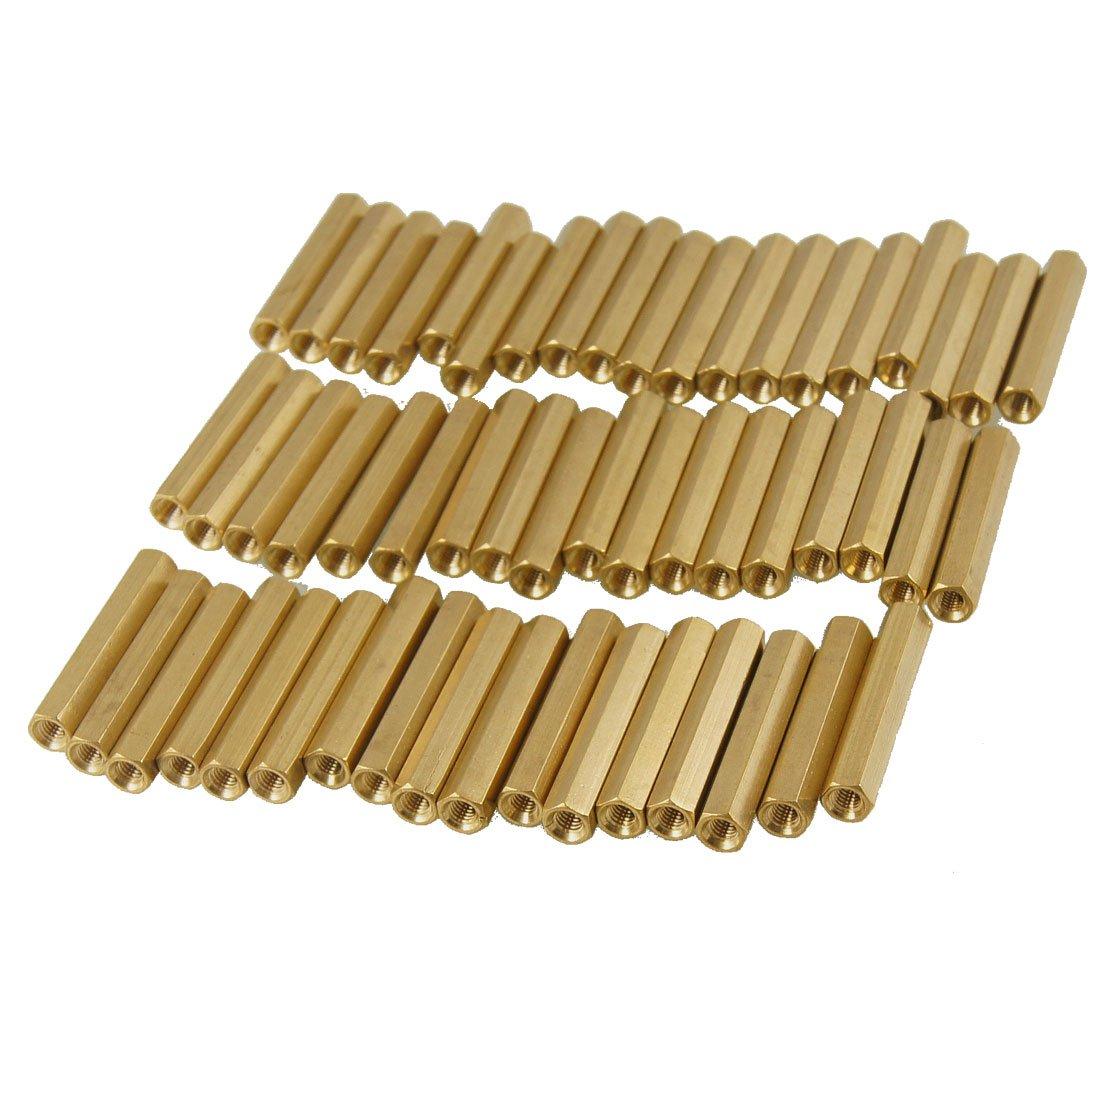 50 Pcs M3X28mm Brass Hex Hexagonal Female Thread PCB Standoff Spacers